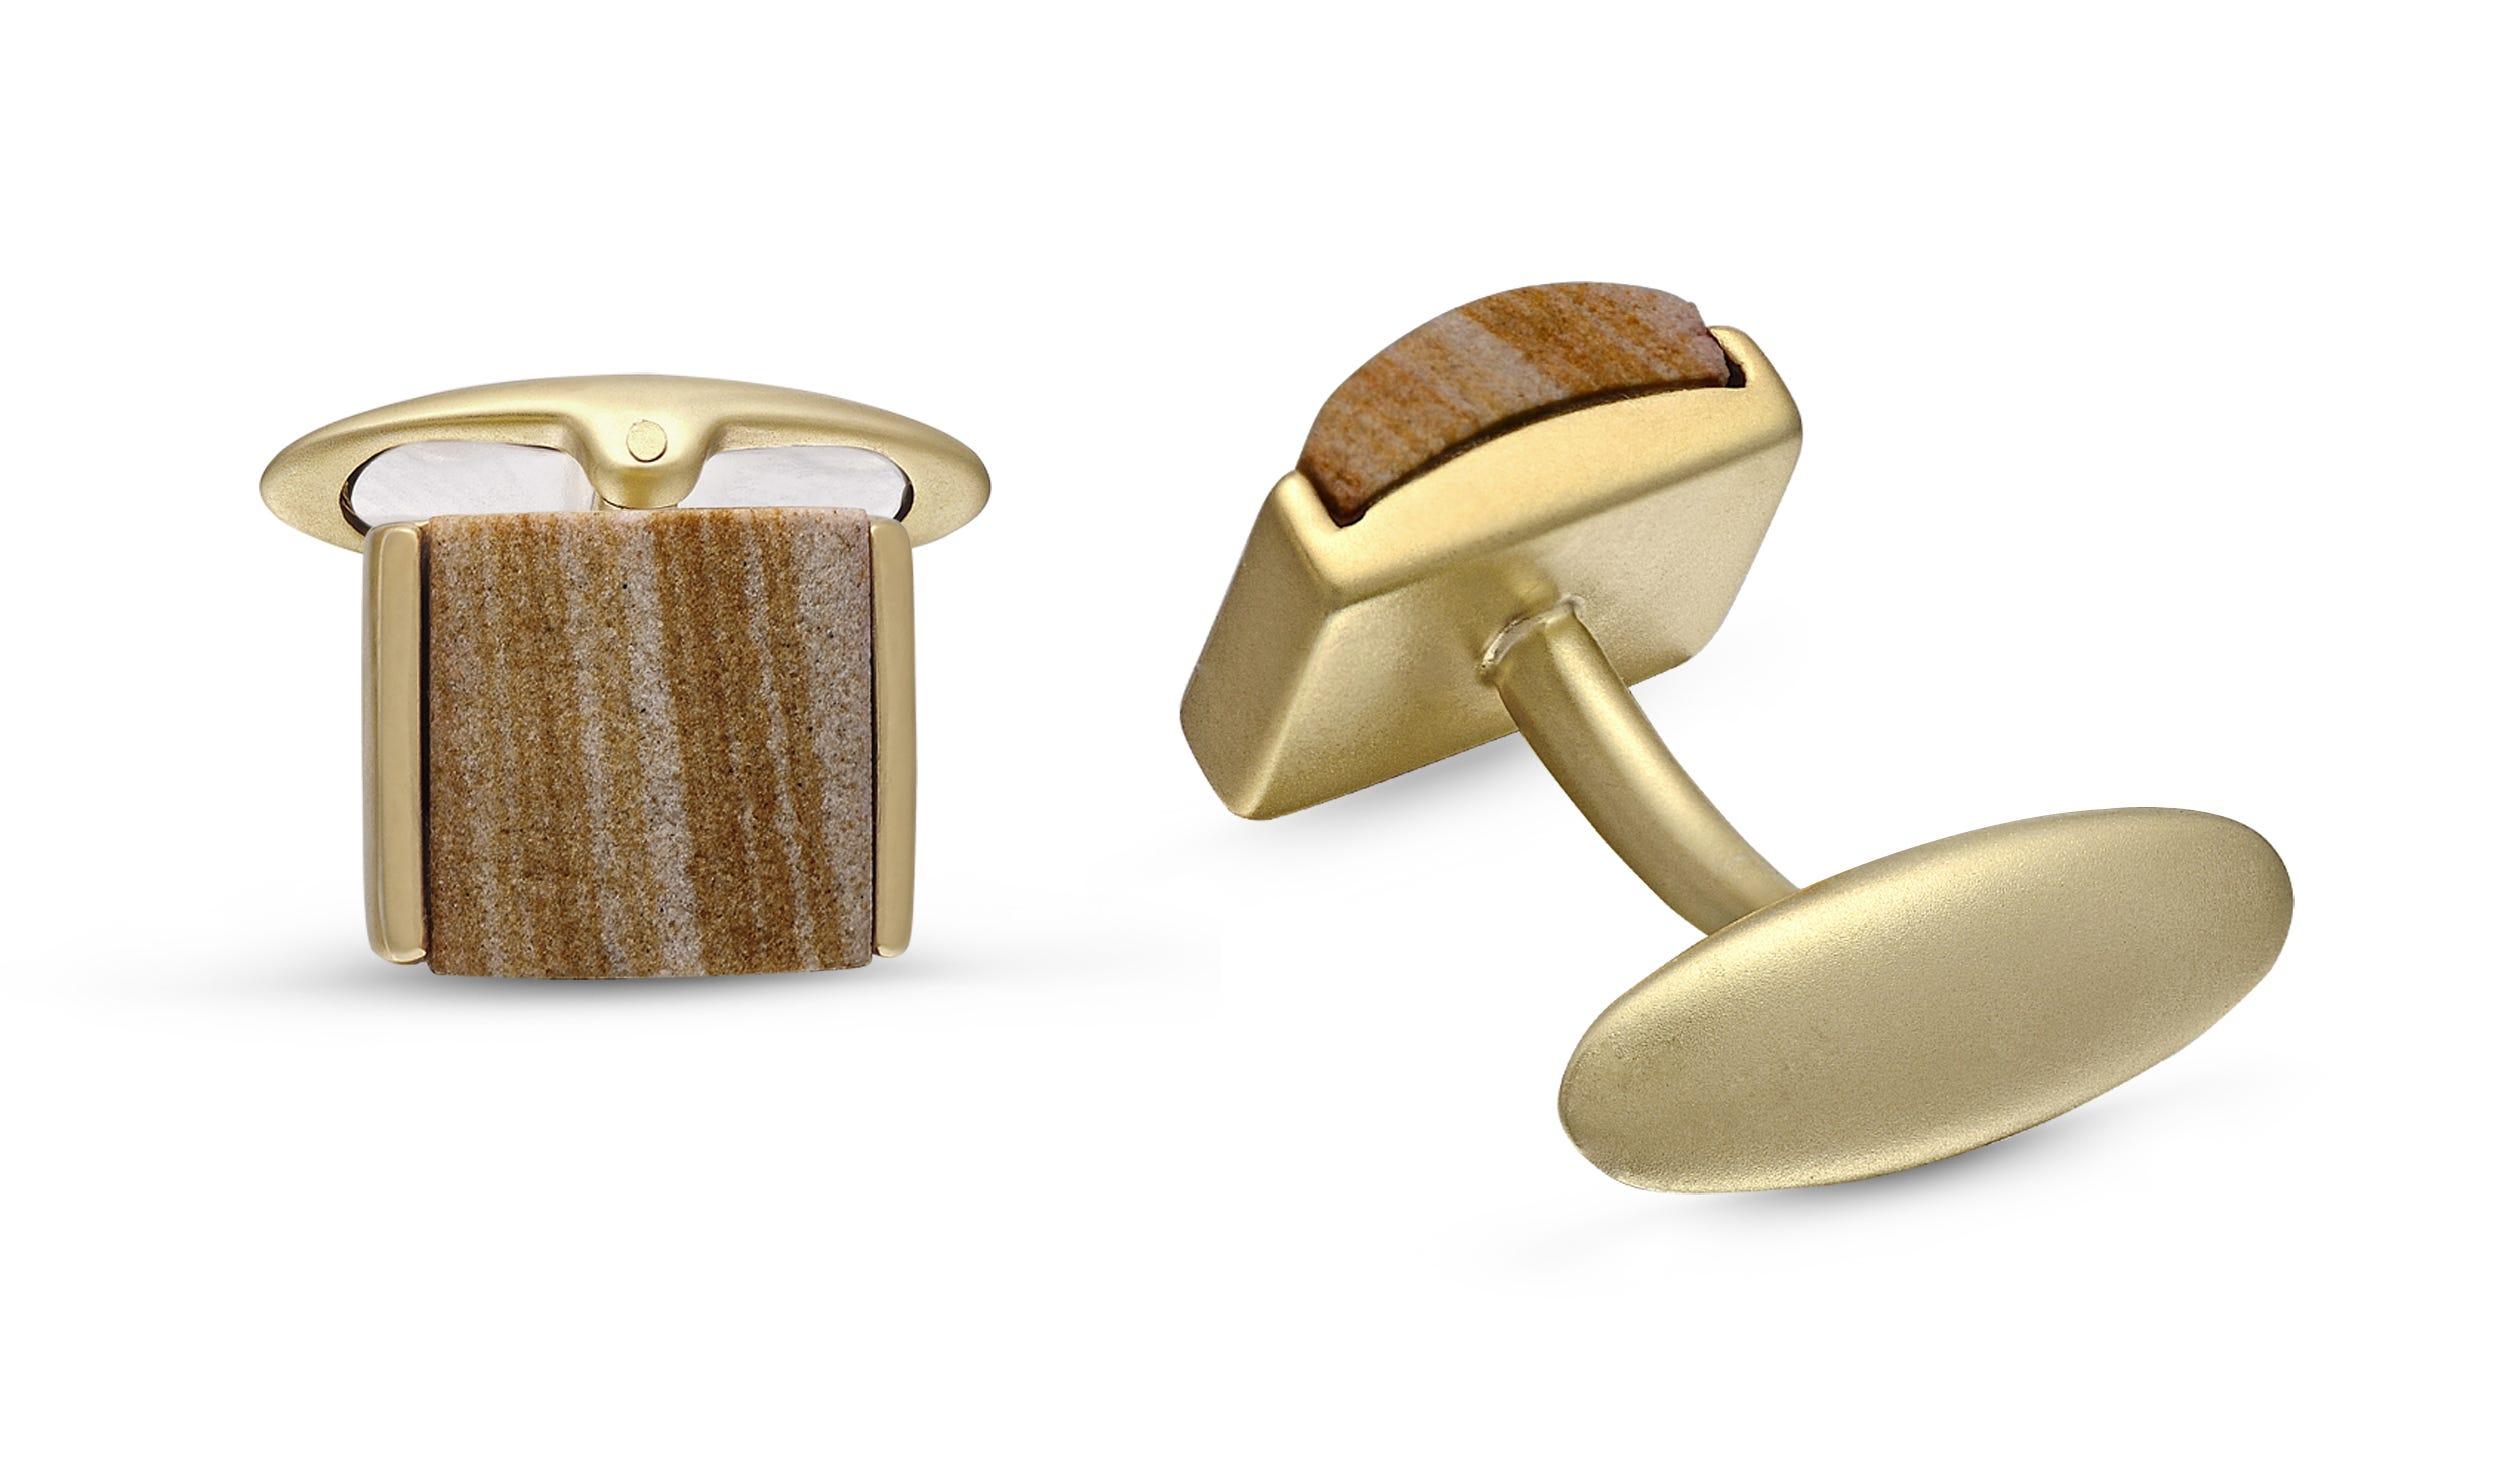 Wood Jasper Stone Cufflinks in Sterling Silver & 14k Yellow Gold Plating